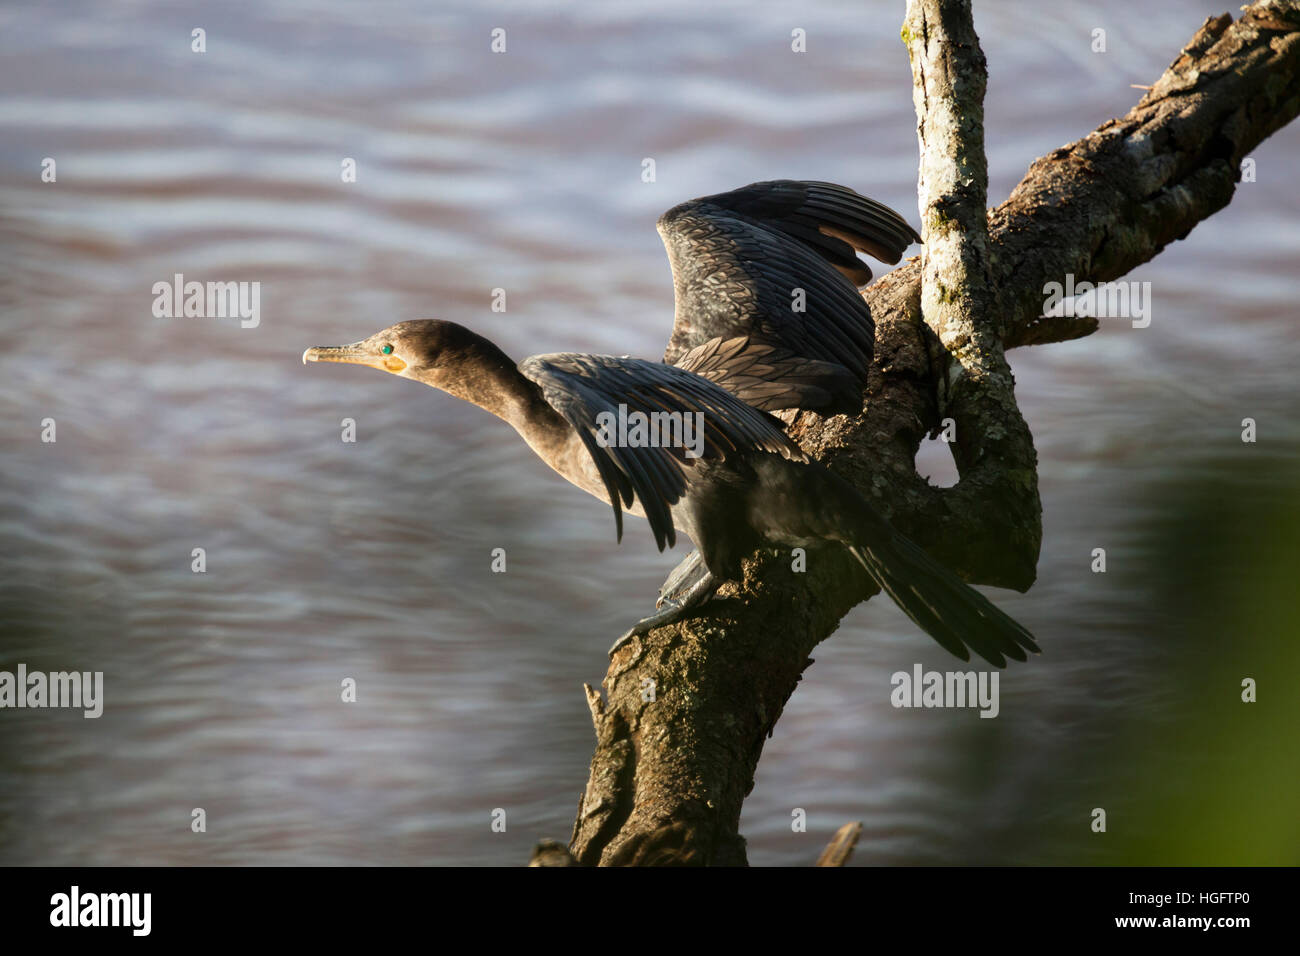 Neotropic cormorant, Iguazu National Park, Misiones Province, The Northeast, Argentina, South America - Stock Image